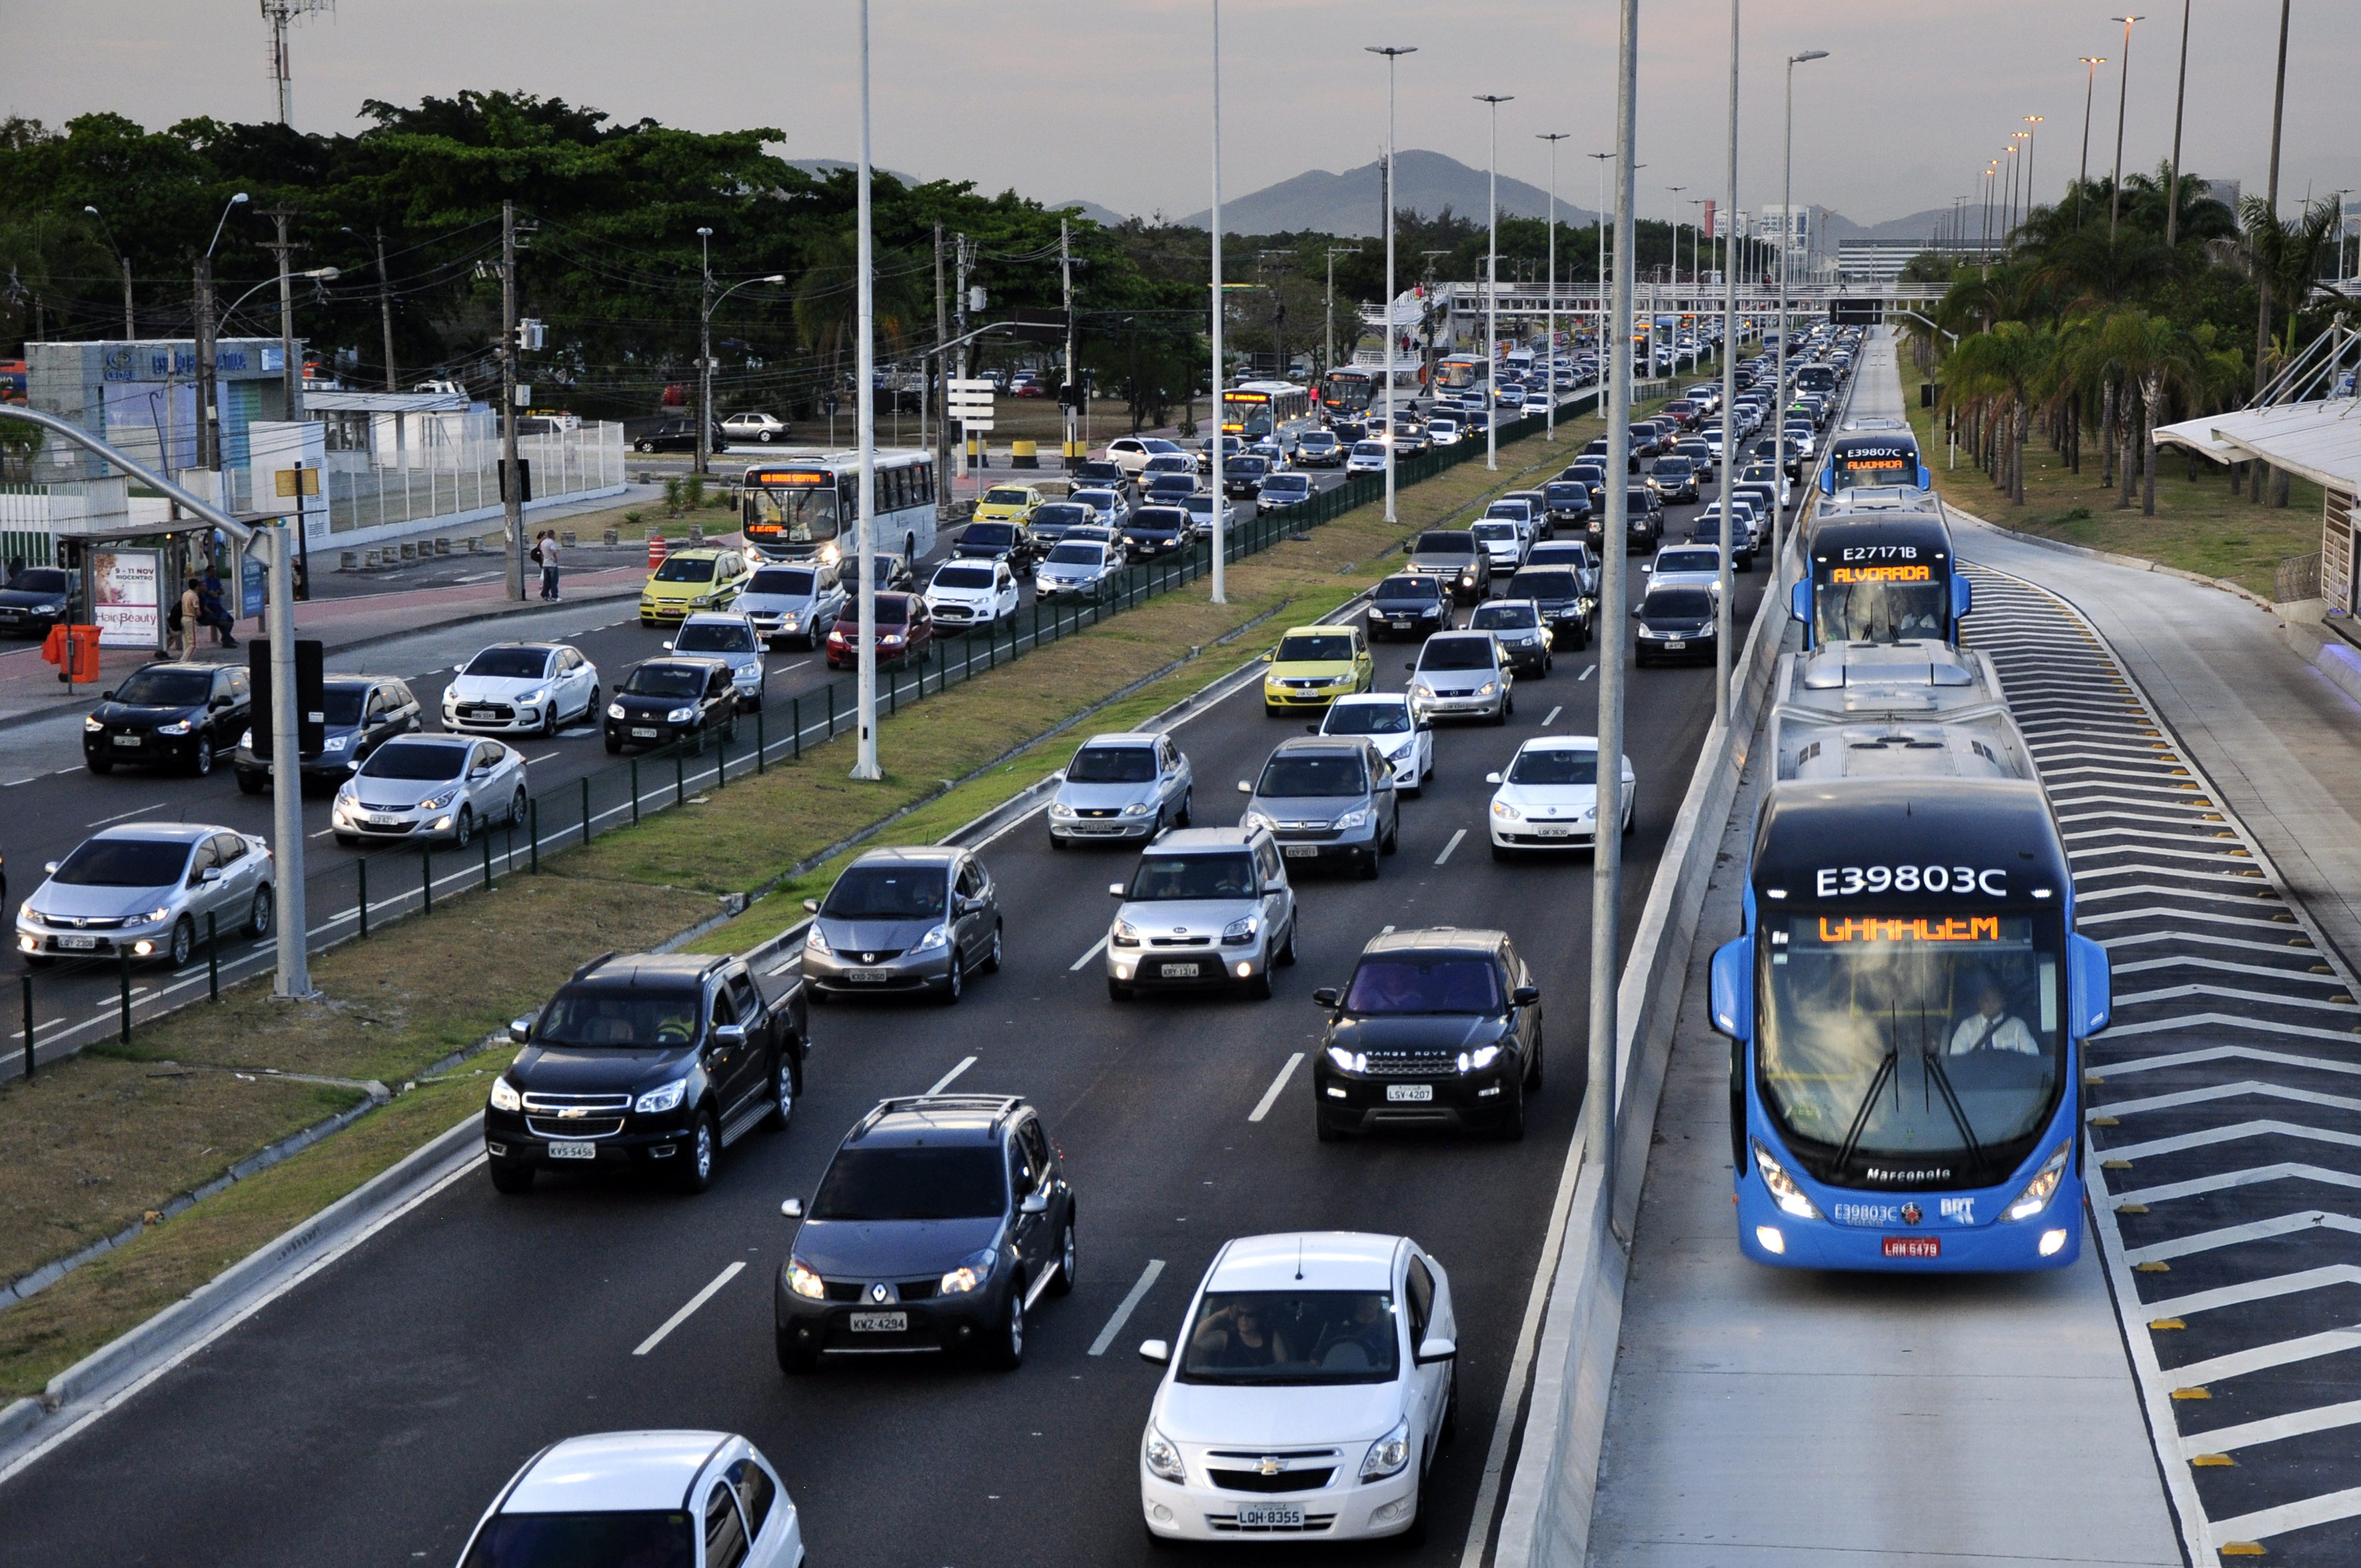 Rio Olympics Legacy Urban Mobility Thecityfix